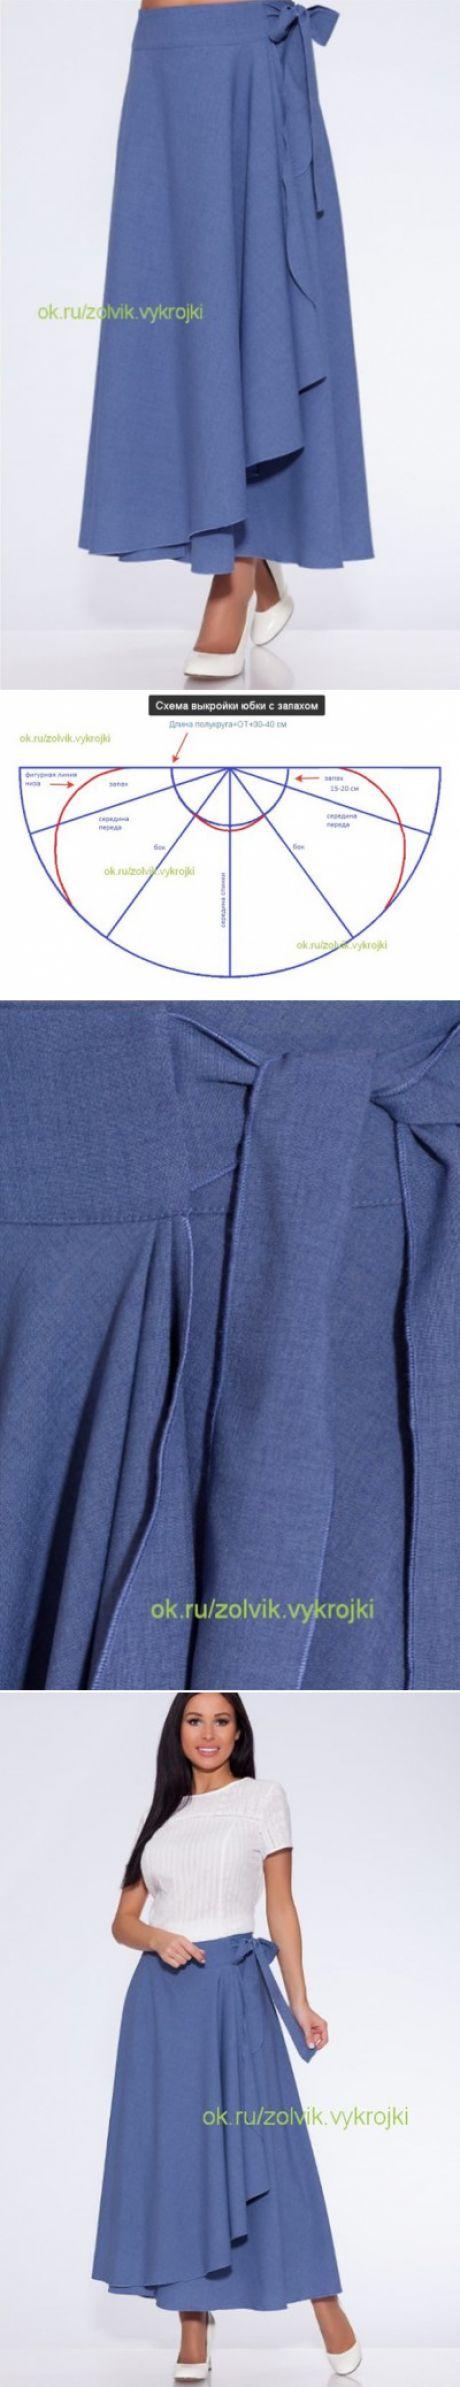 Blusa manga fofa e meia gola | DIY - molde, corte e costura - Marlene Mukai | Шитьё | Postila